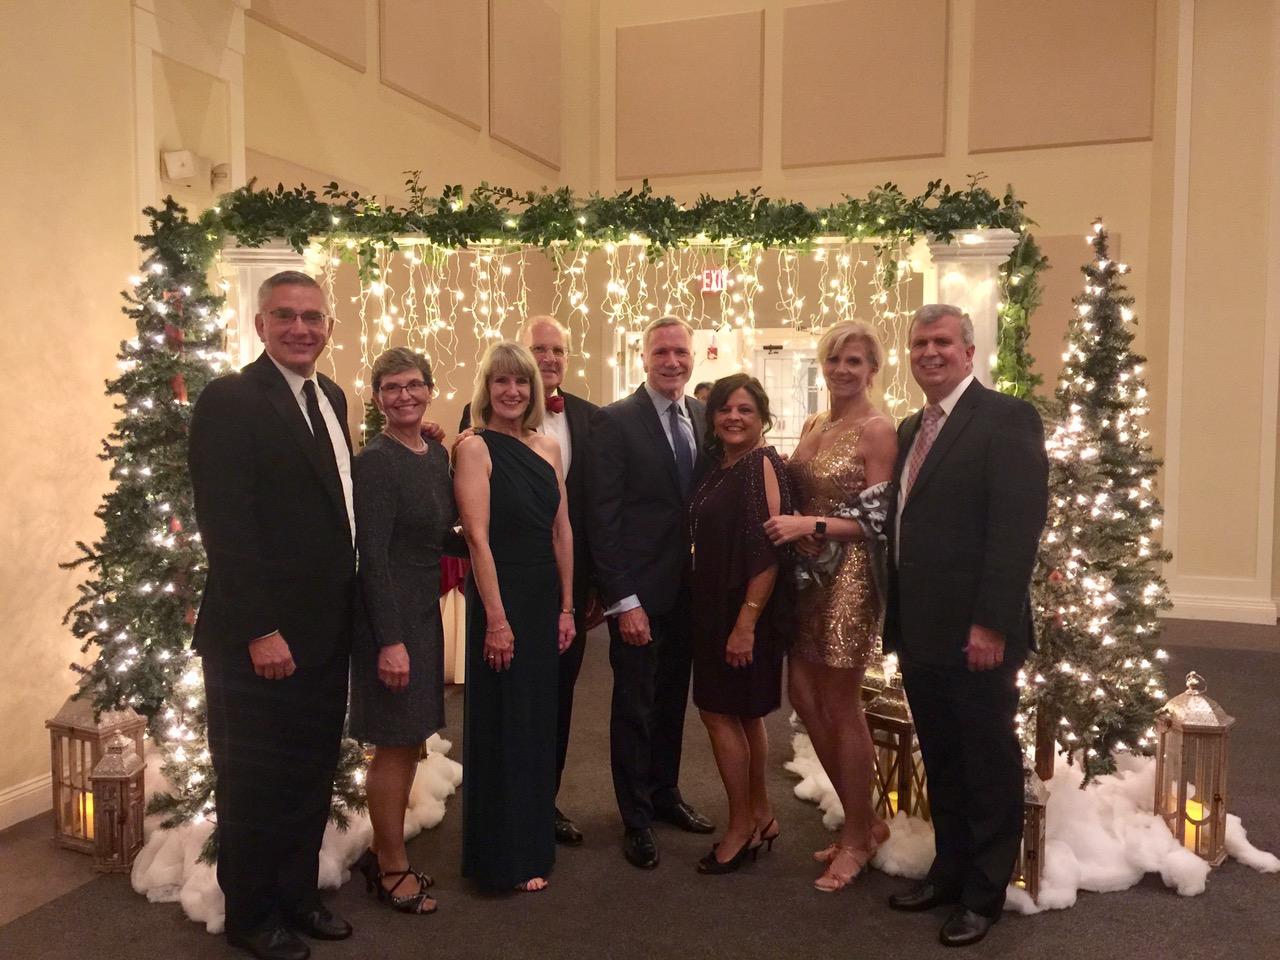 Michael, Debbie, Claire, Bob, Ron, Lynette, Joanna, Ed